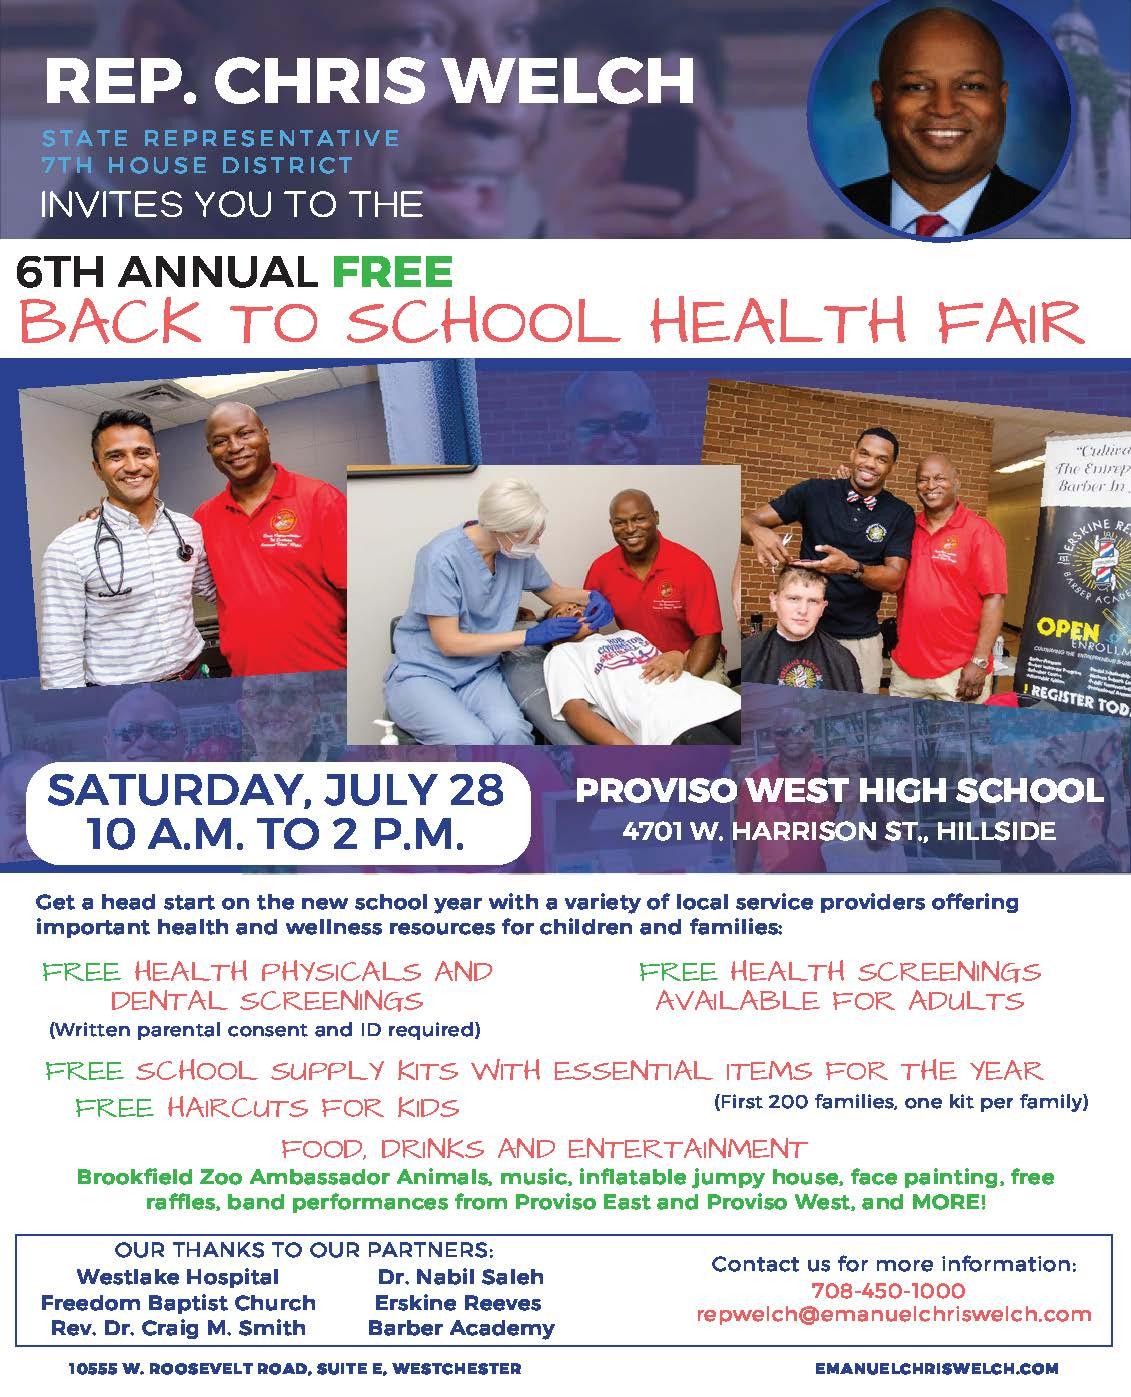 Rep. Welch Back to School Health Fair flyer  2018.jpg